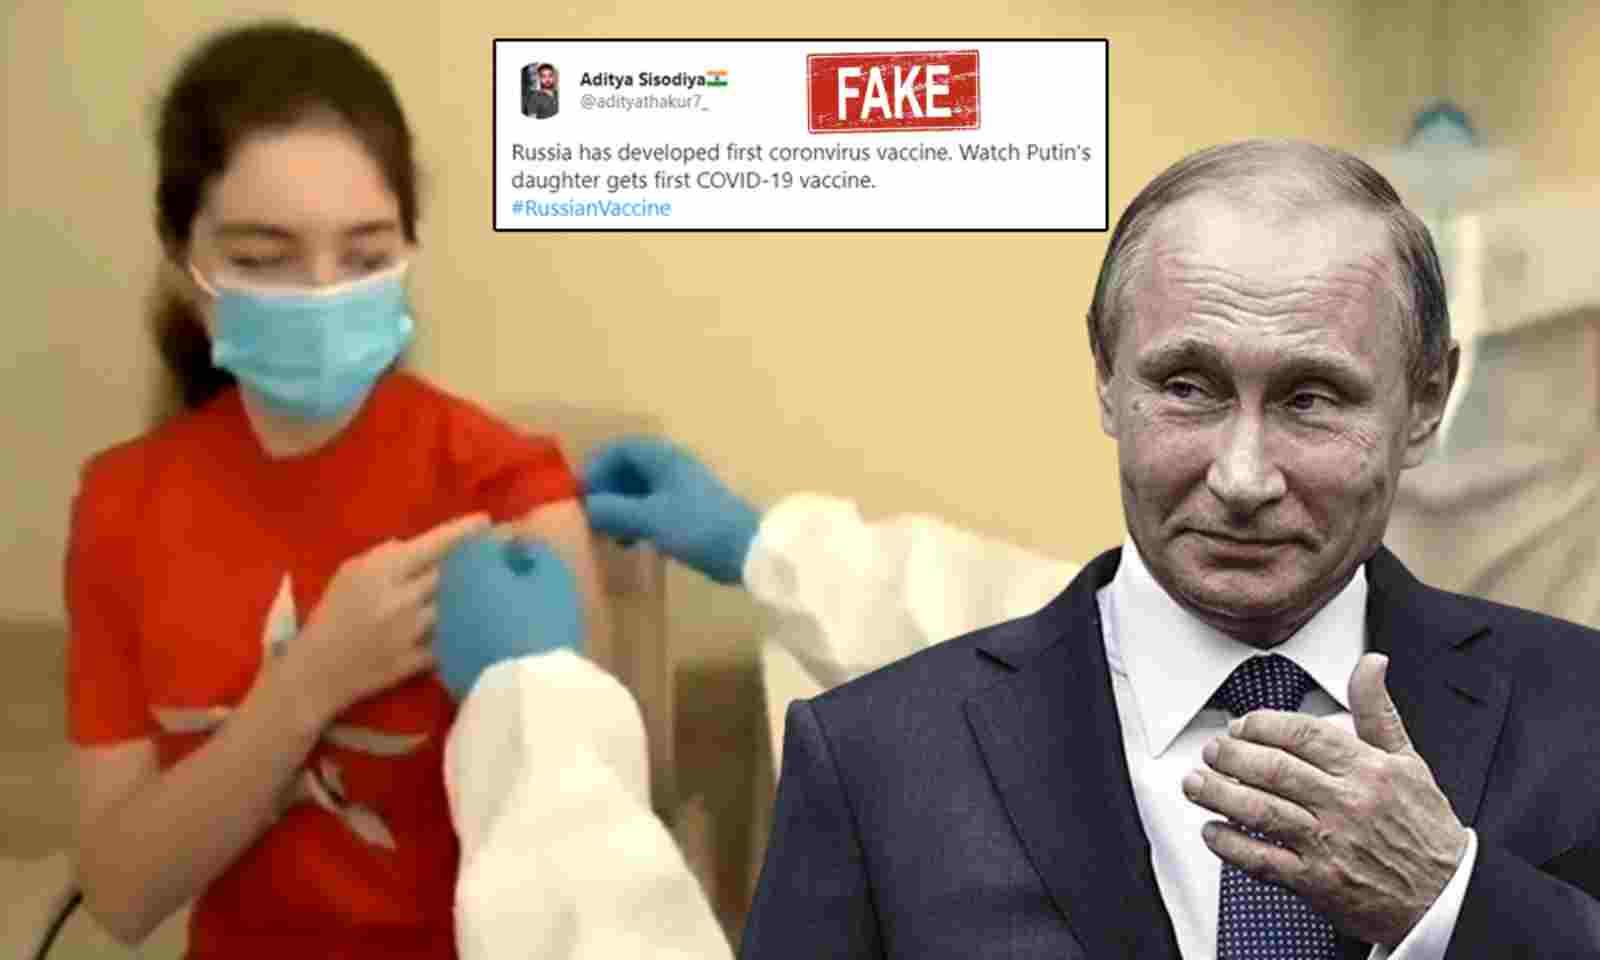 Video Of Volunteer For Human Trial Falsely Shared As Putin S Daughter Getting Coronavirus Vaccine Shot